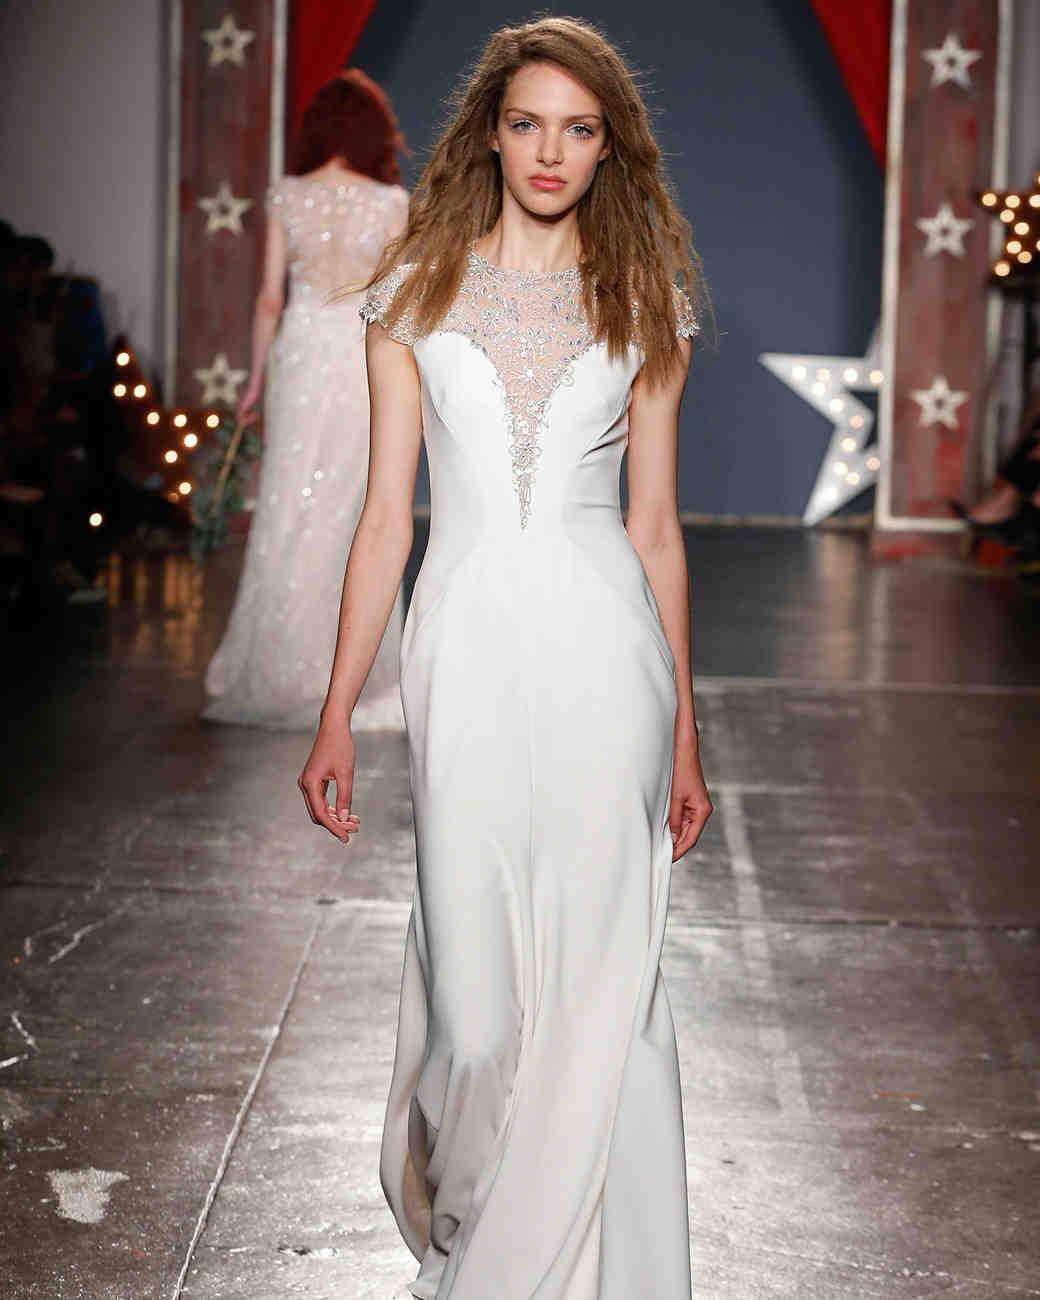 jenny packham wedding dress spring 2018 high neck embellished sheer bodice